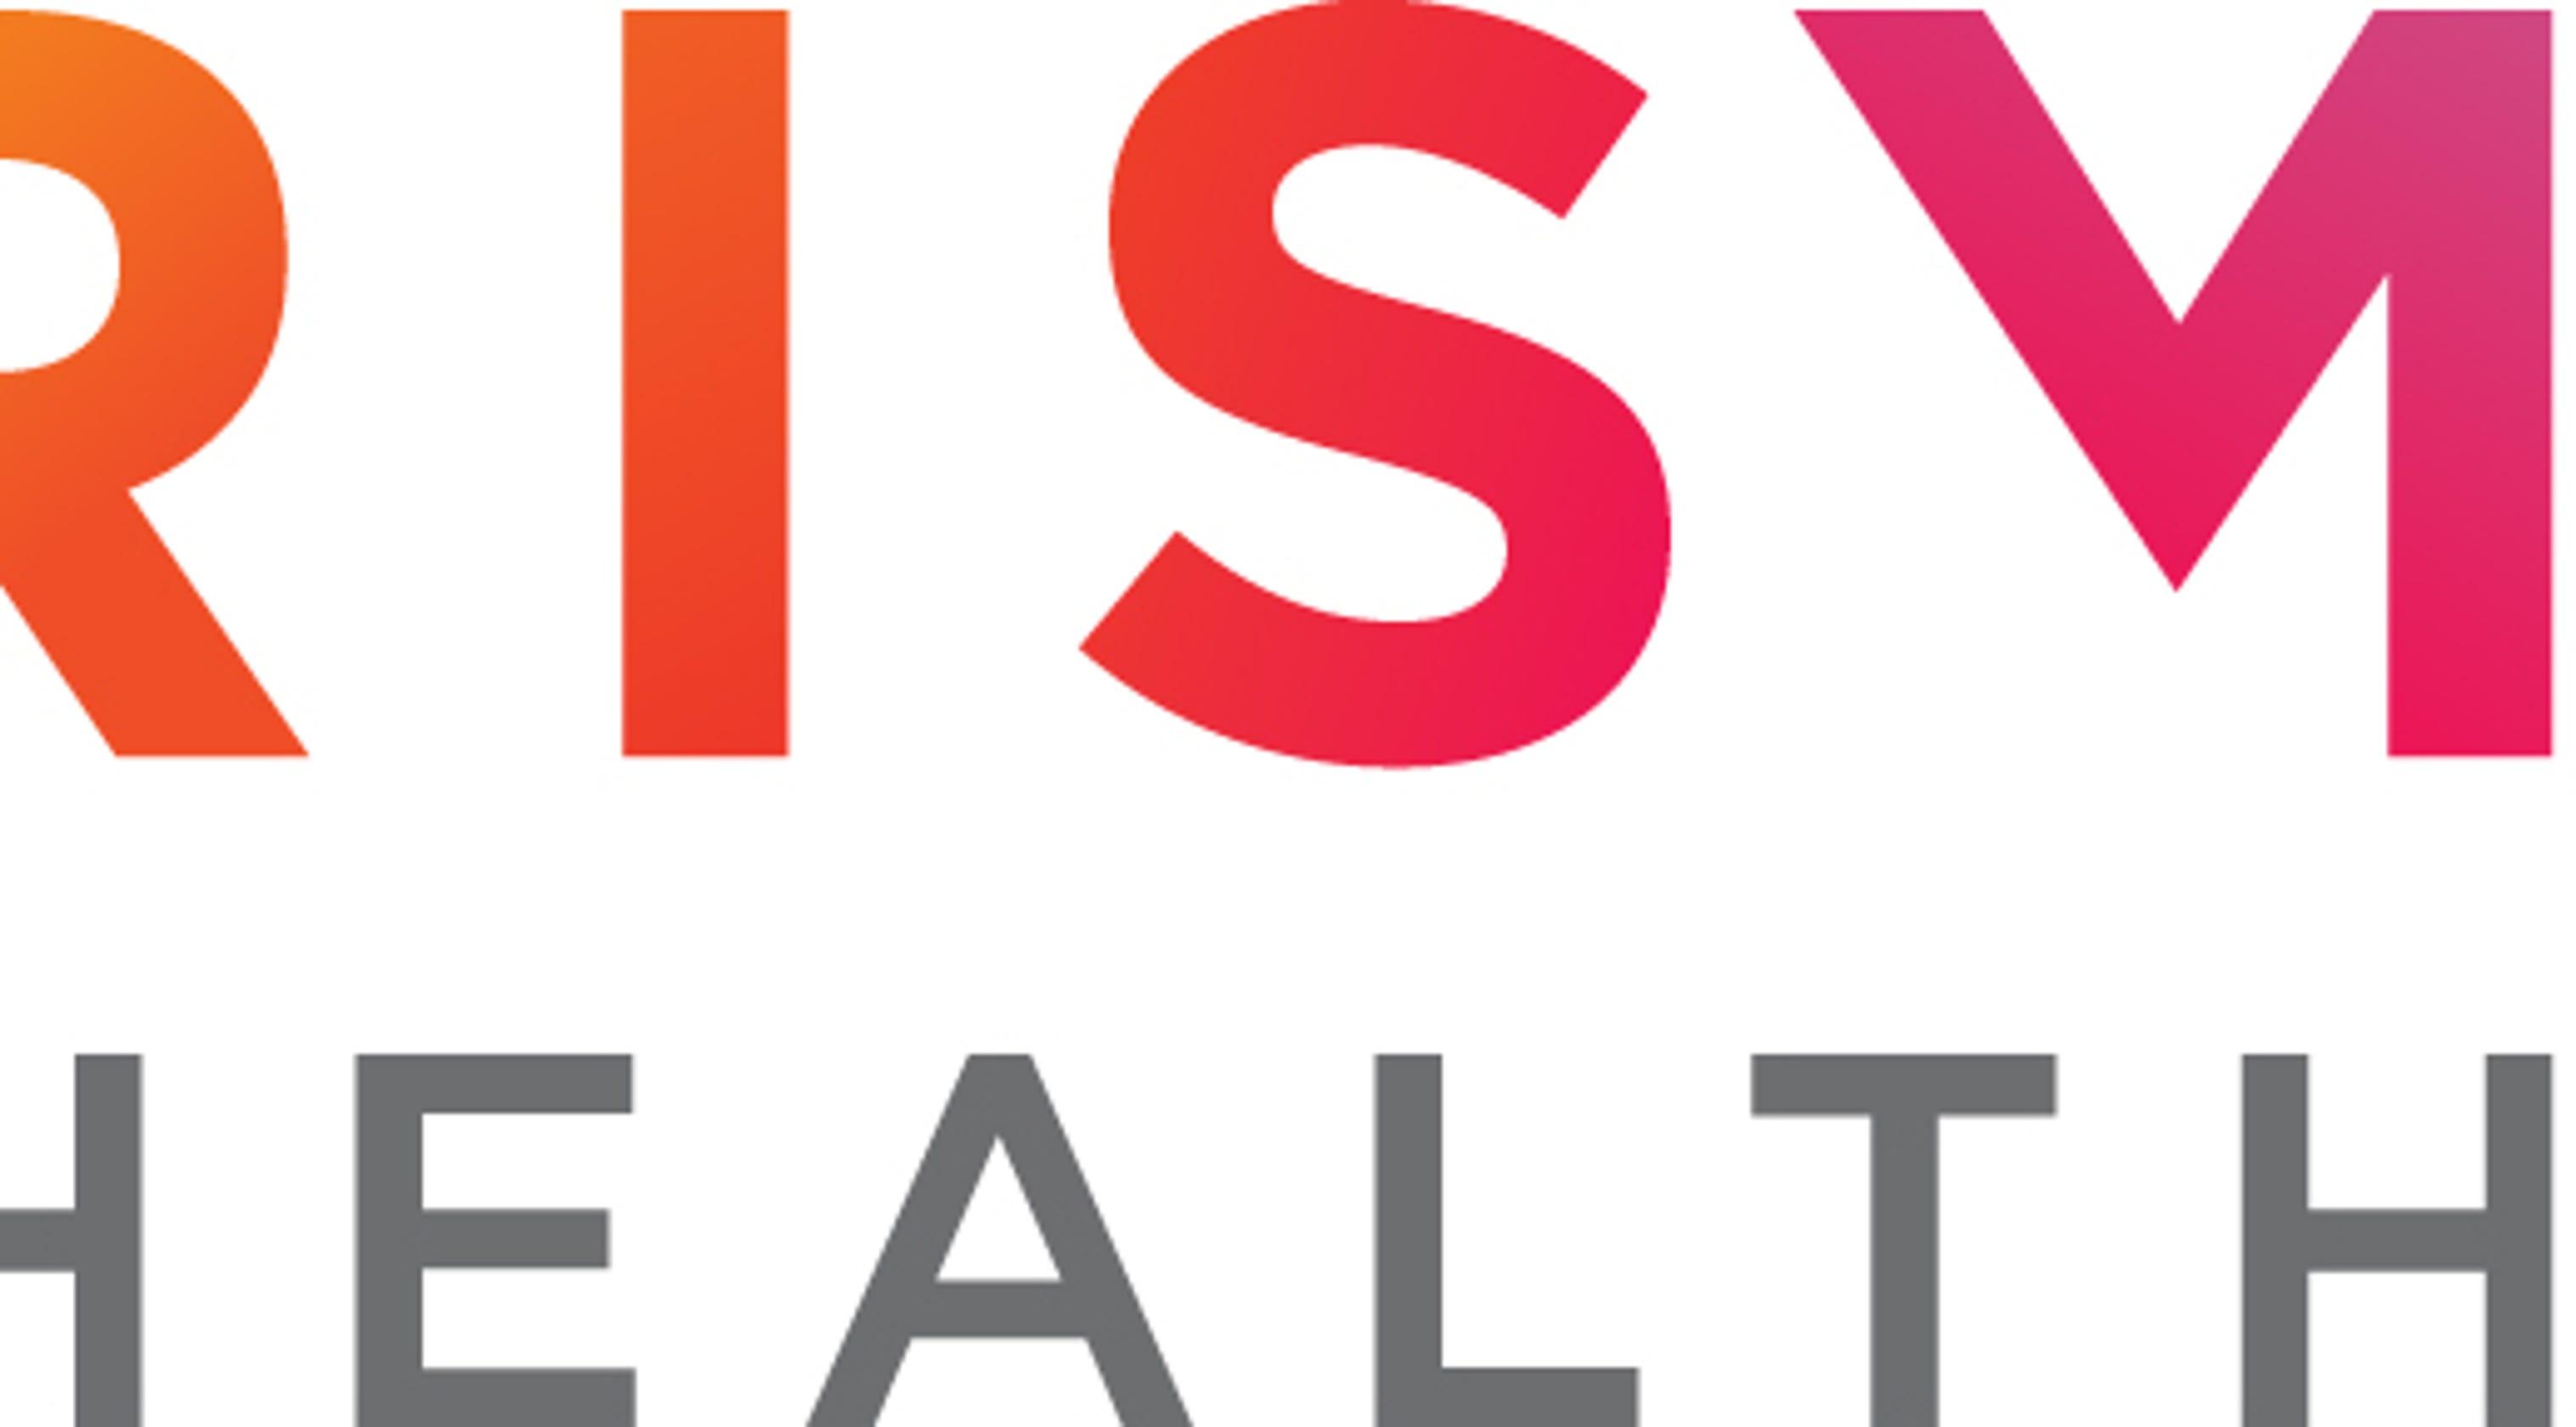 prisma health official logo download